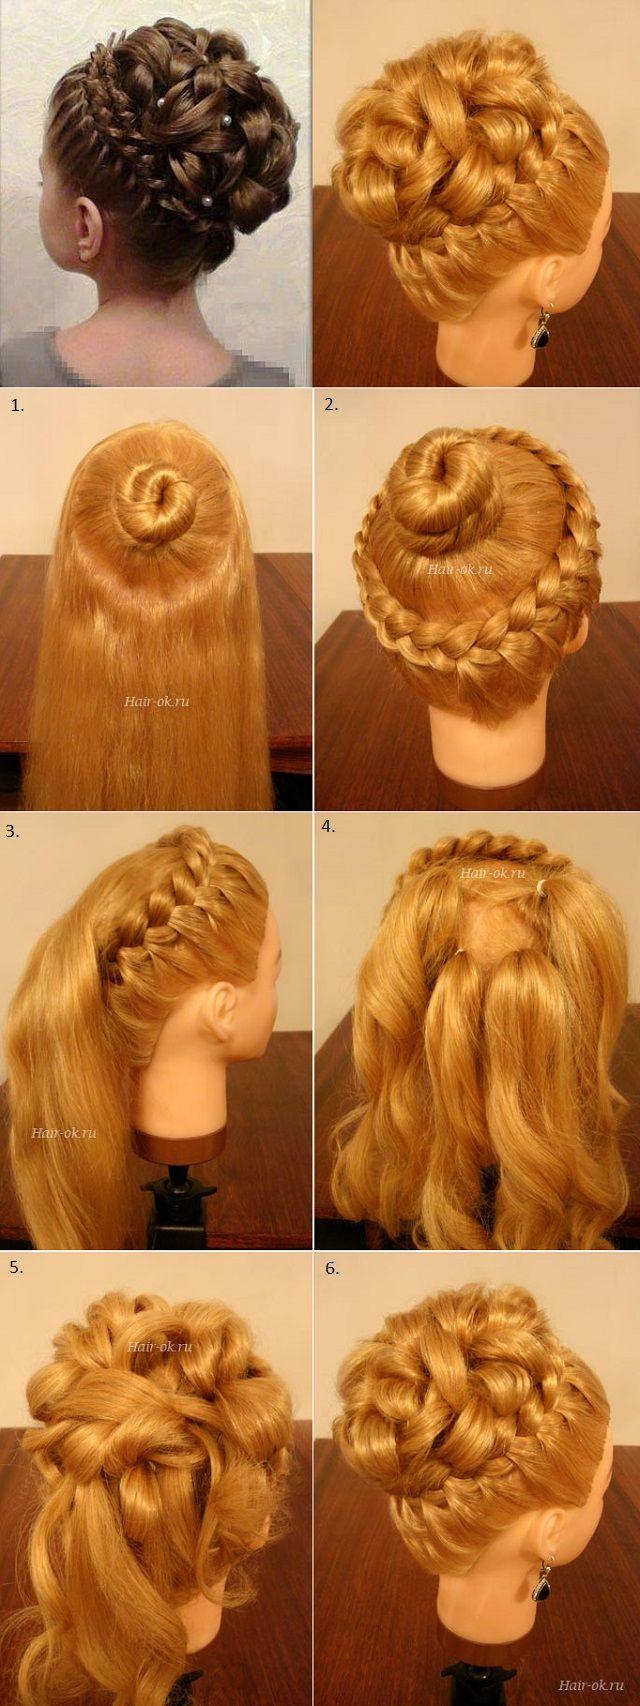 Elegant Braiding Hairstyle With Curls – DIY